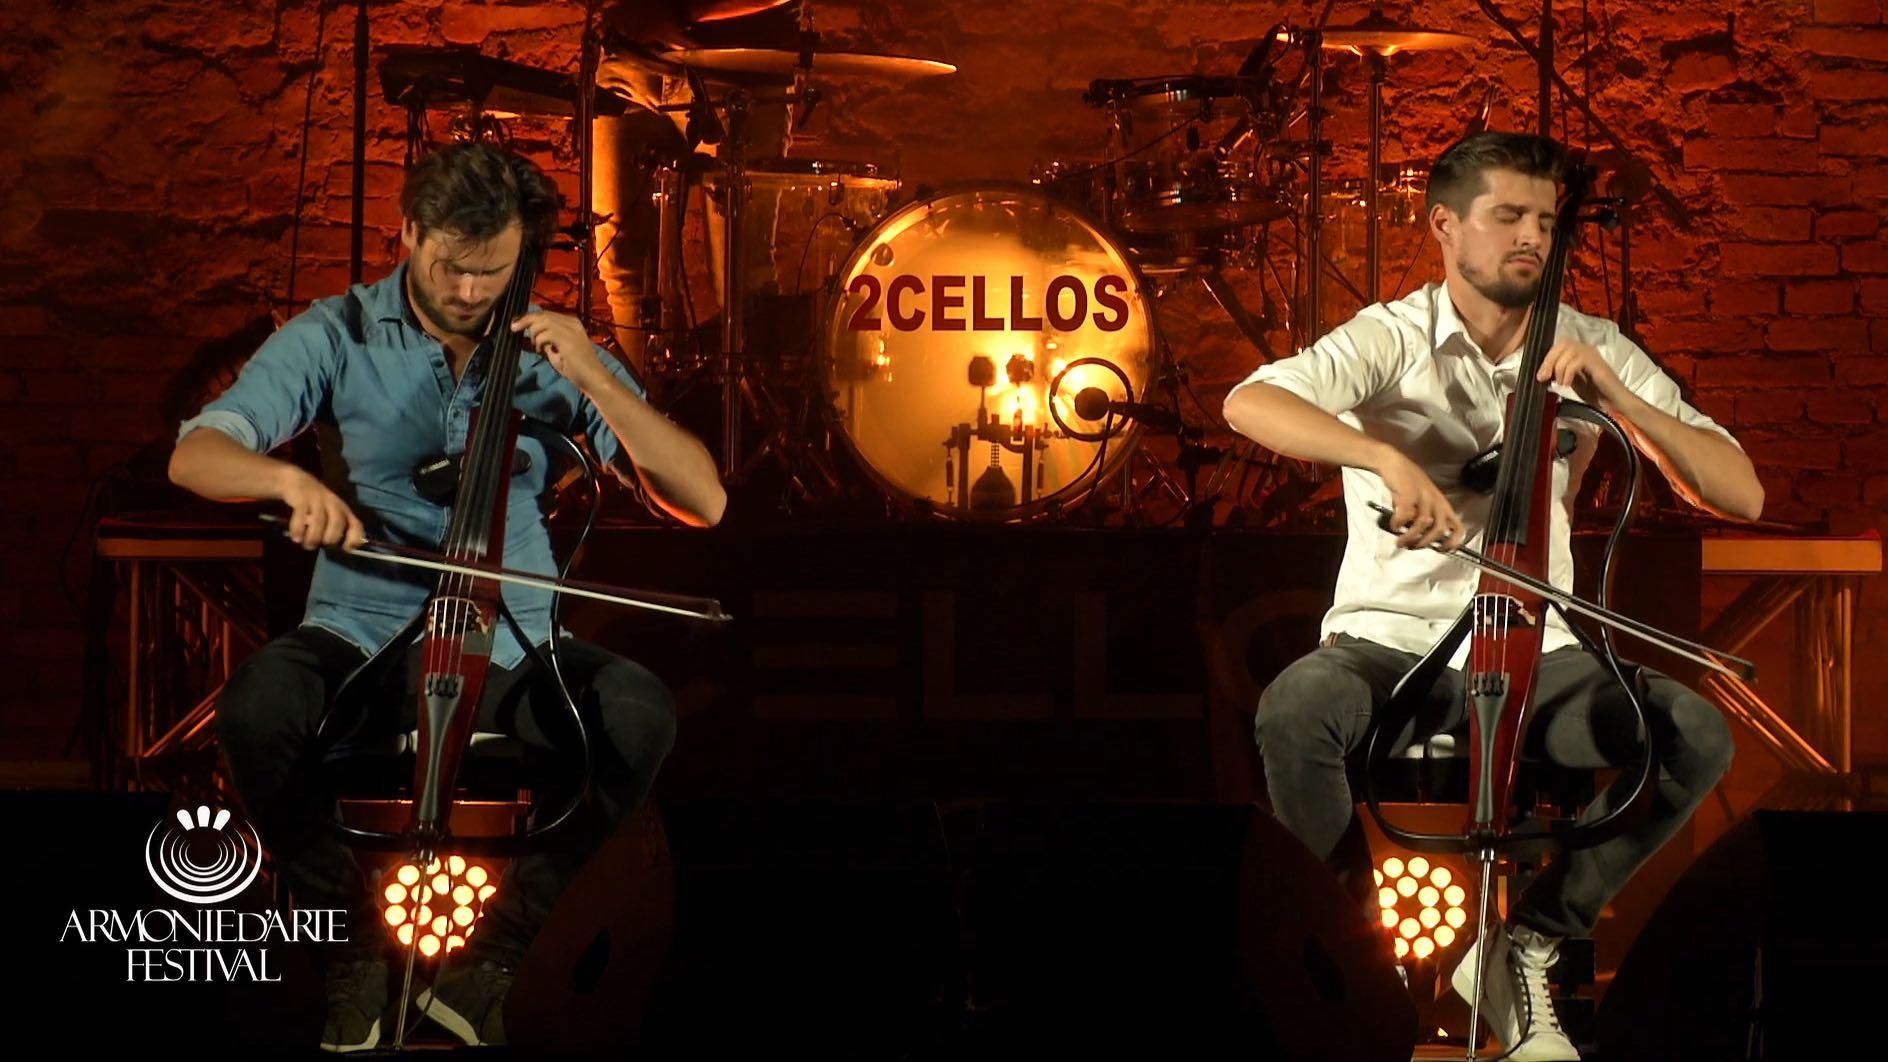 2Cellos with String Orchestra – Armonie d'Arte Festival